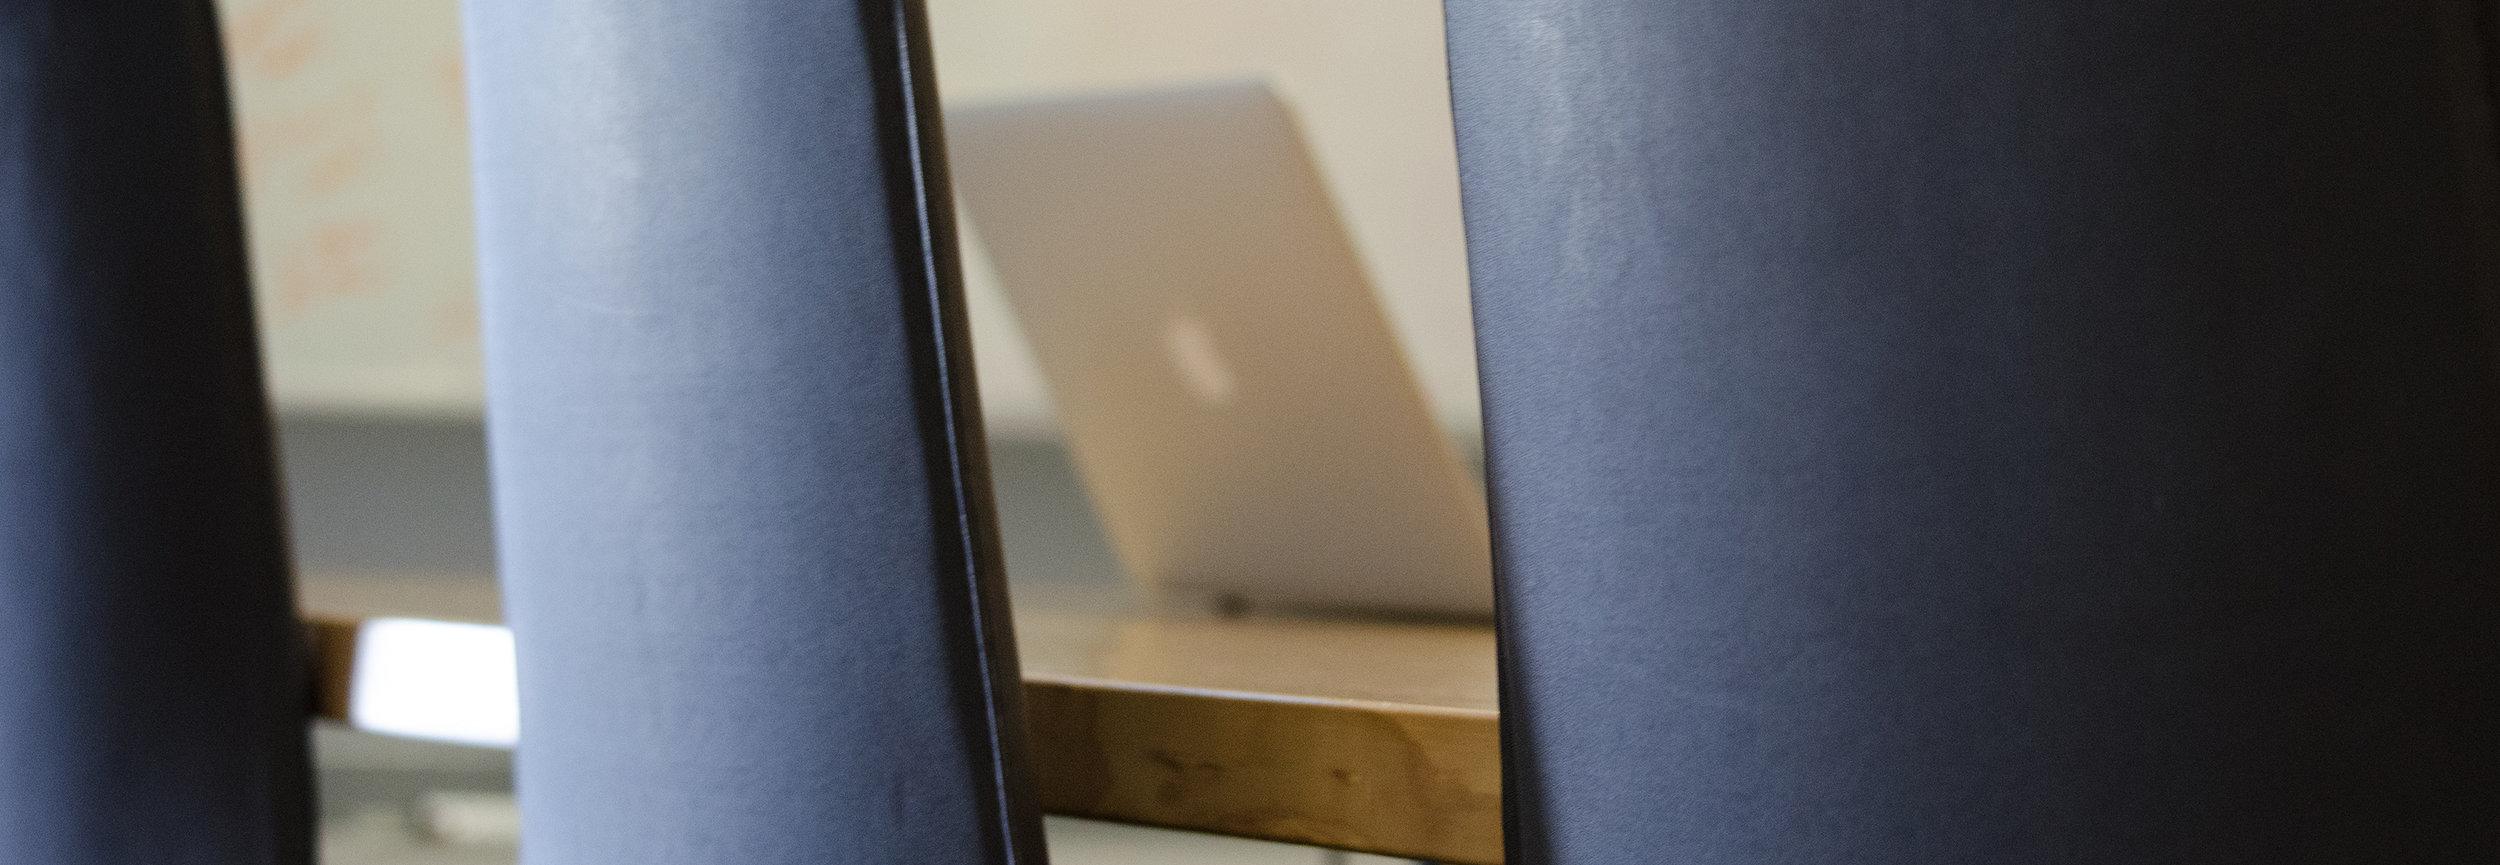 Metro-Screen-green-screen-studio-in-action cropped.jpg